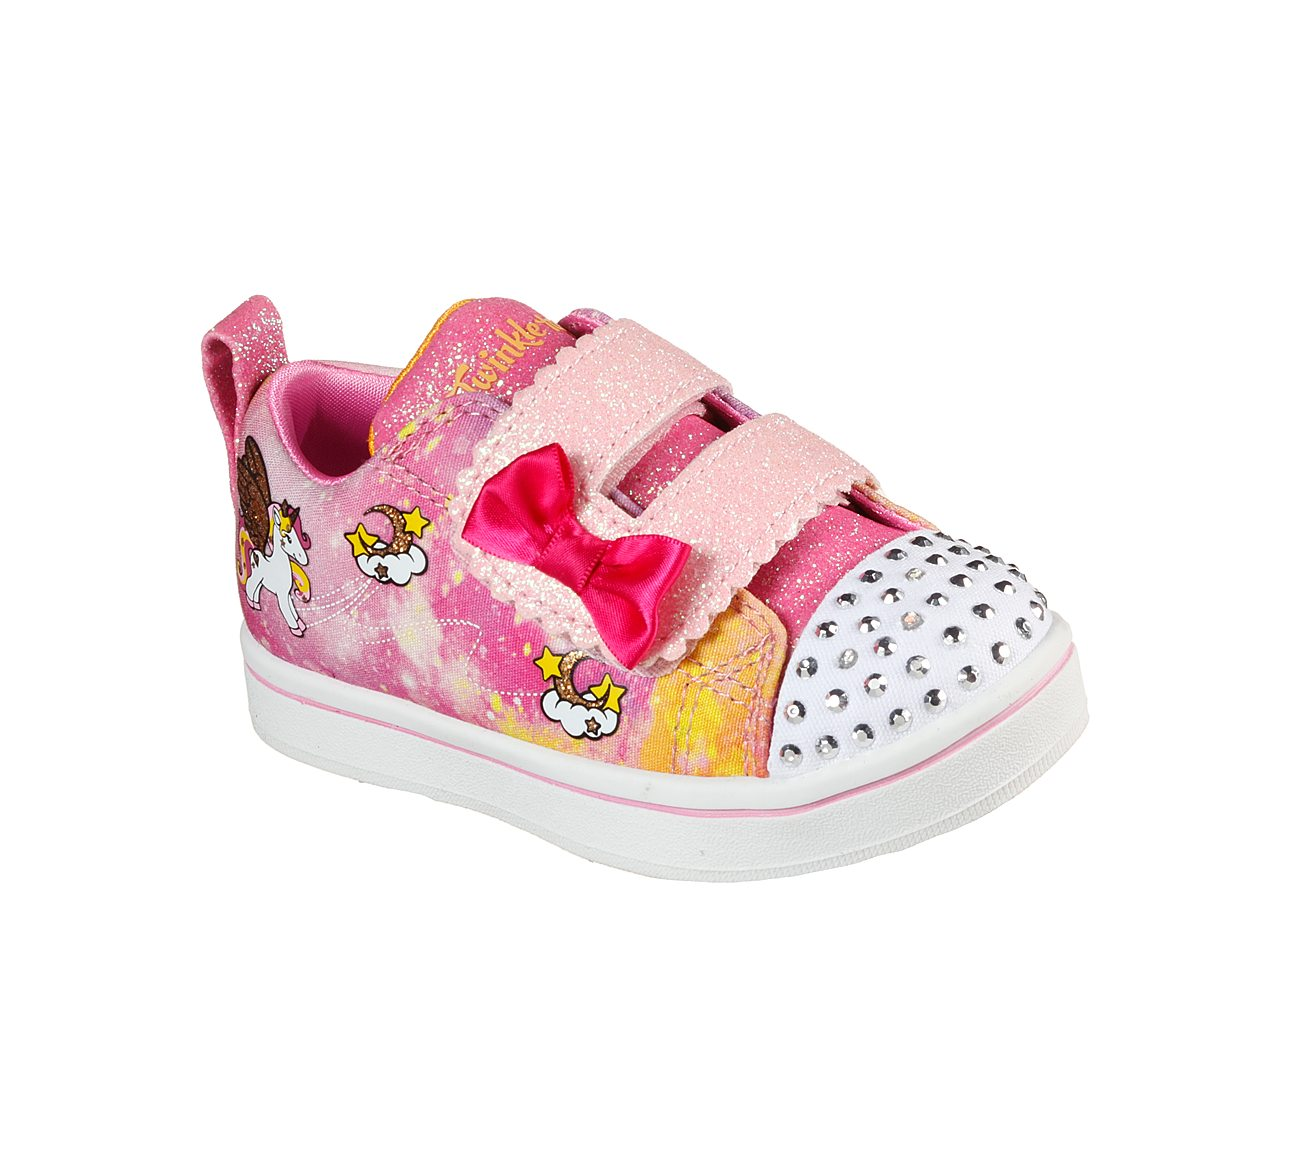 Buy SKECHERS Twinkle Toes: Sparkle Rayz